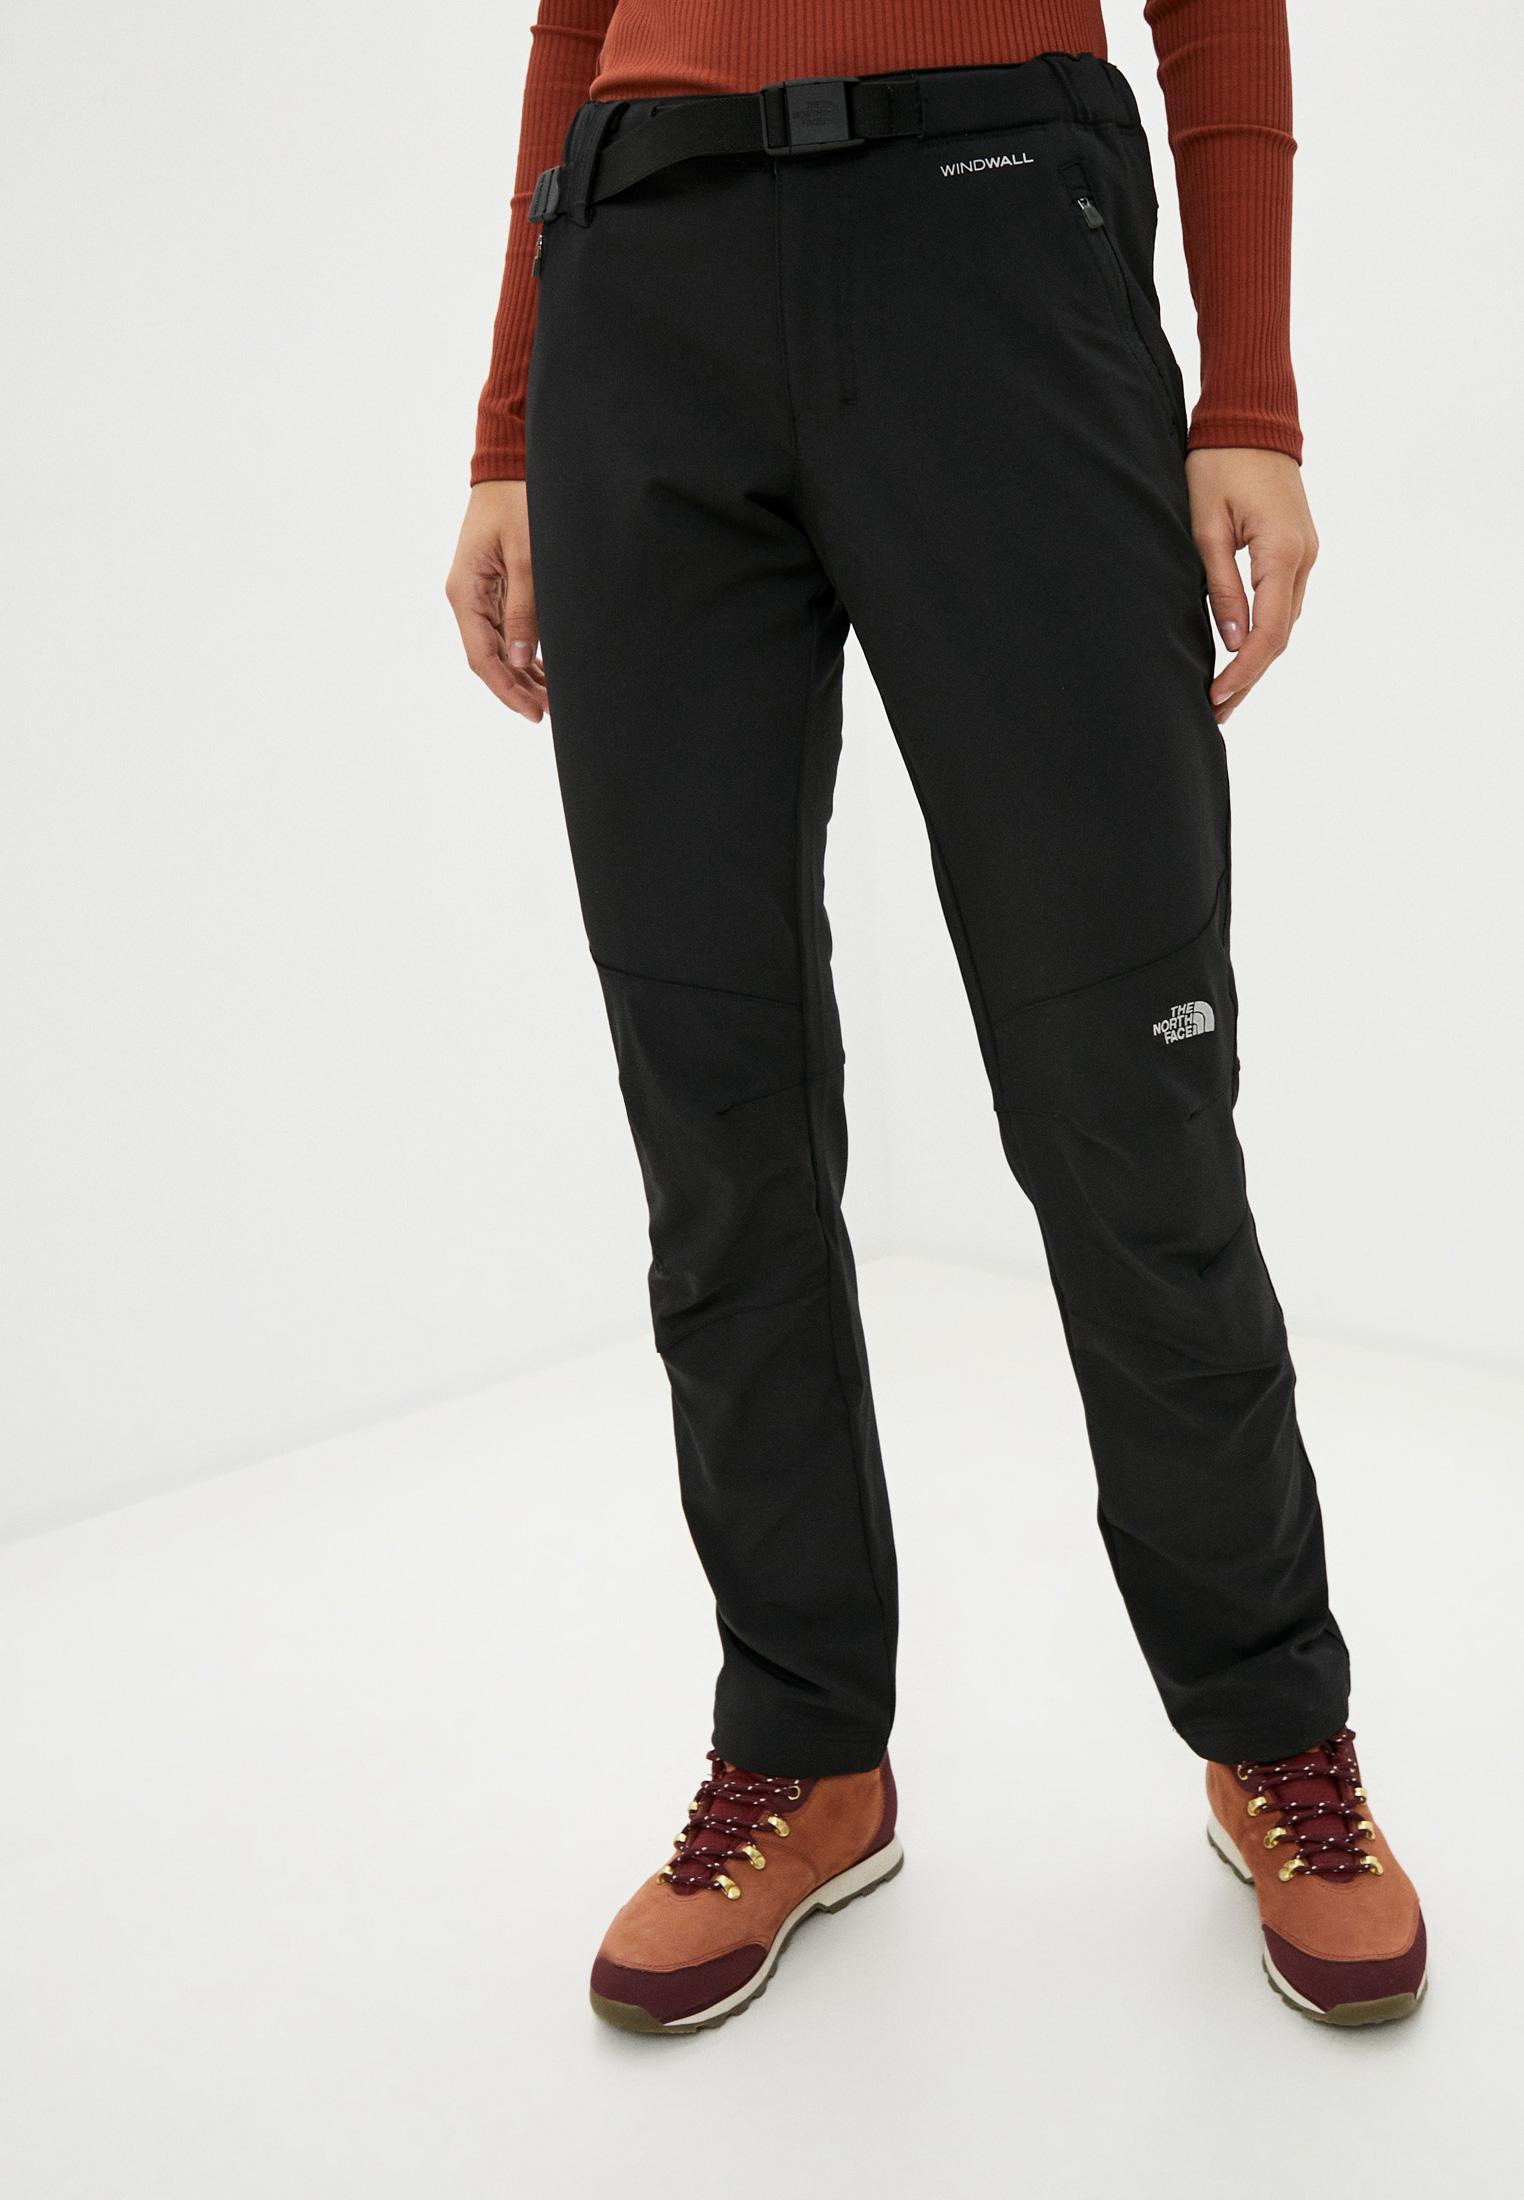 Женские брюки The North Face (Зе Норт Фейс) T0A8MQJK3